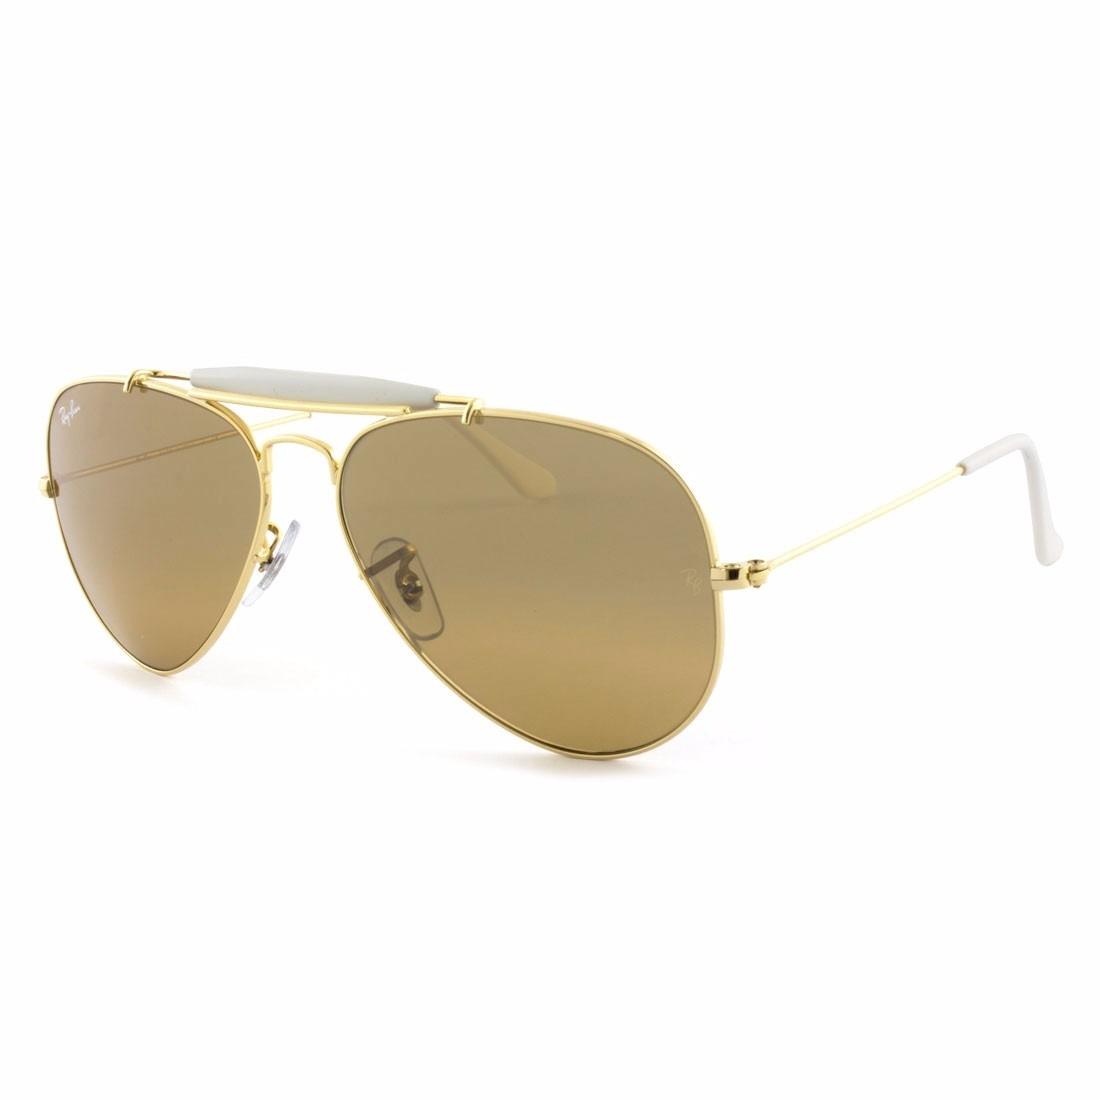 516f2e216 Óculos De Sol Ray Ban Rb3407 001/3k 58-14 2n - R$ 590,00 em Mercado ...